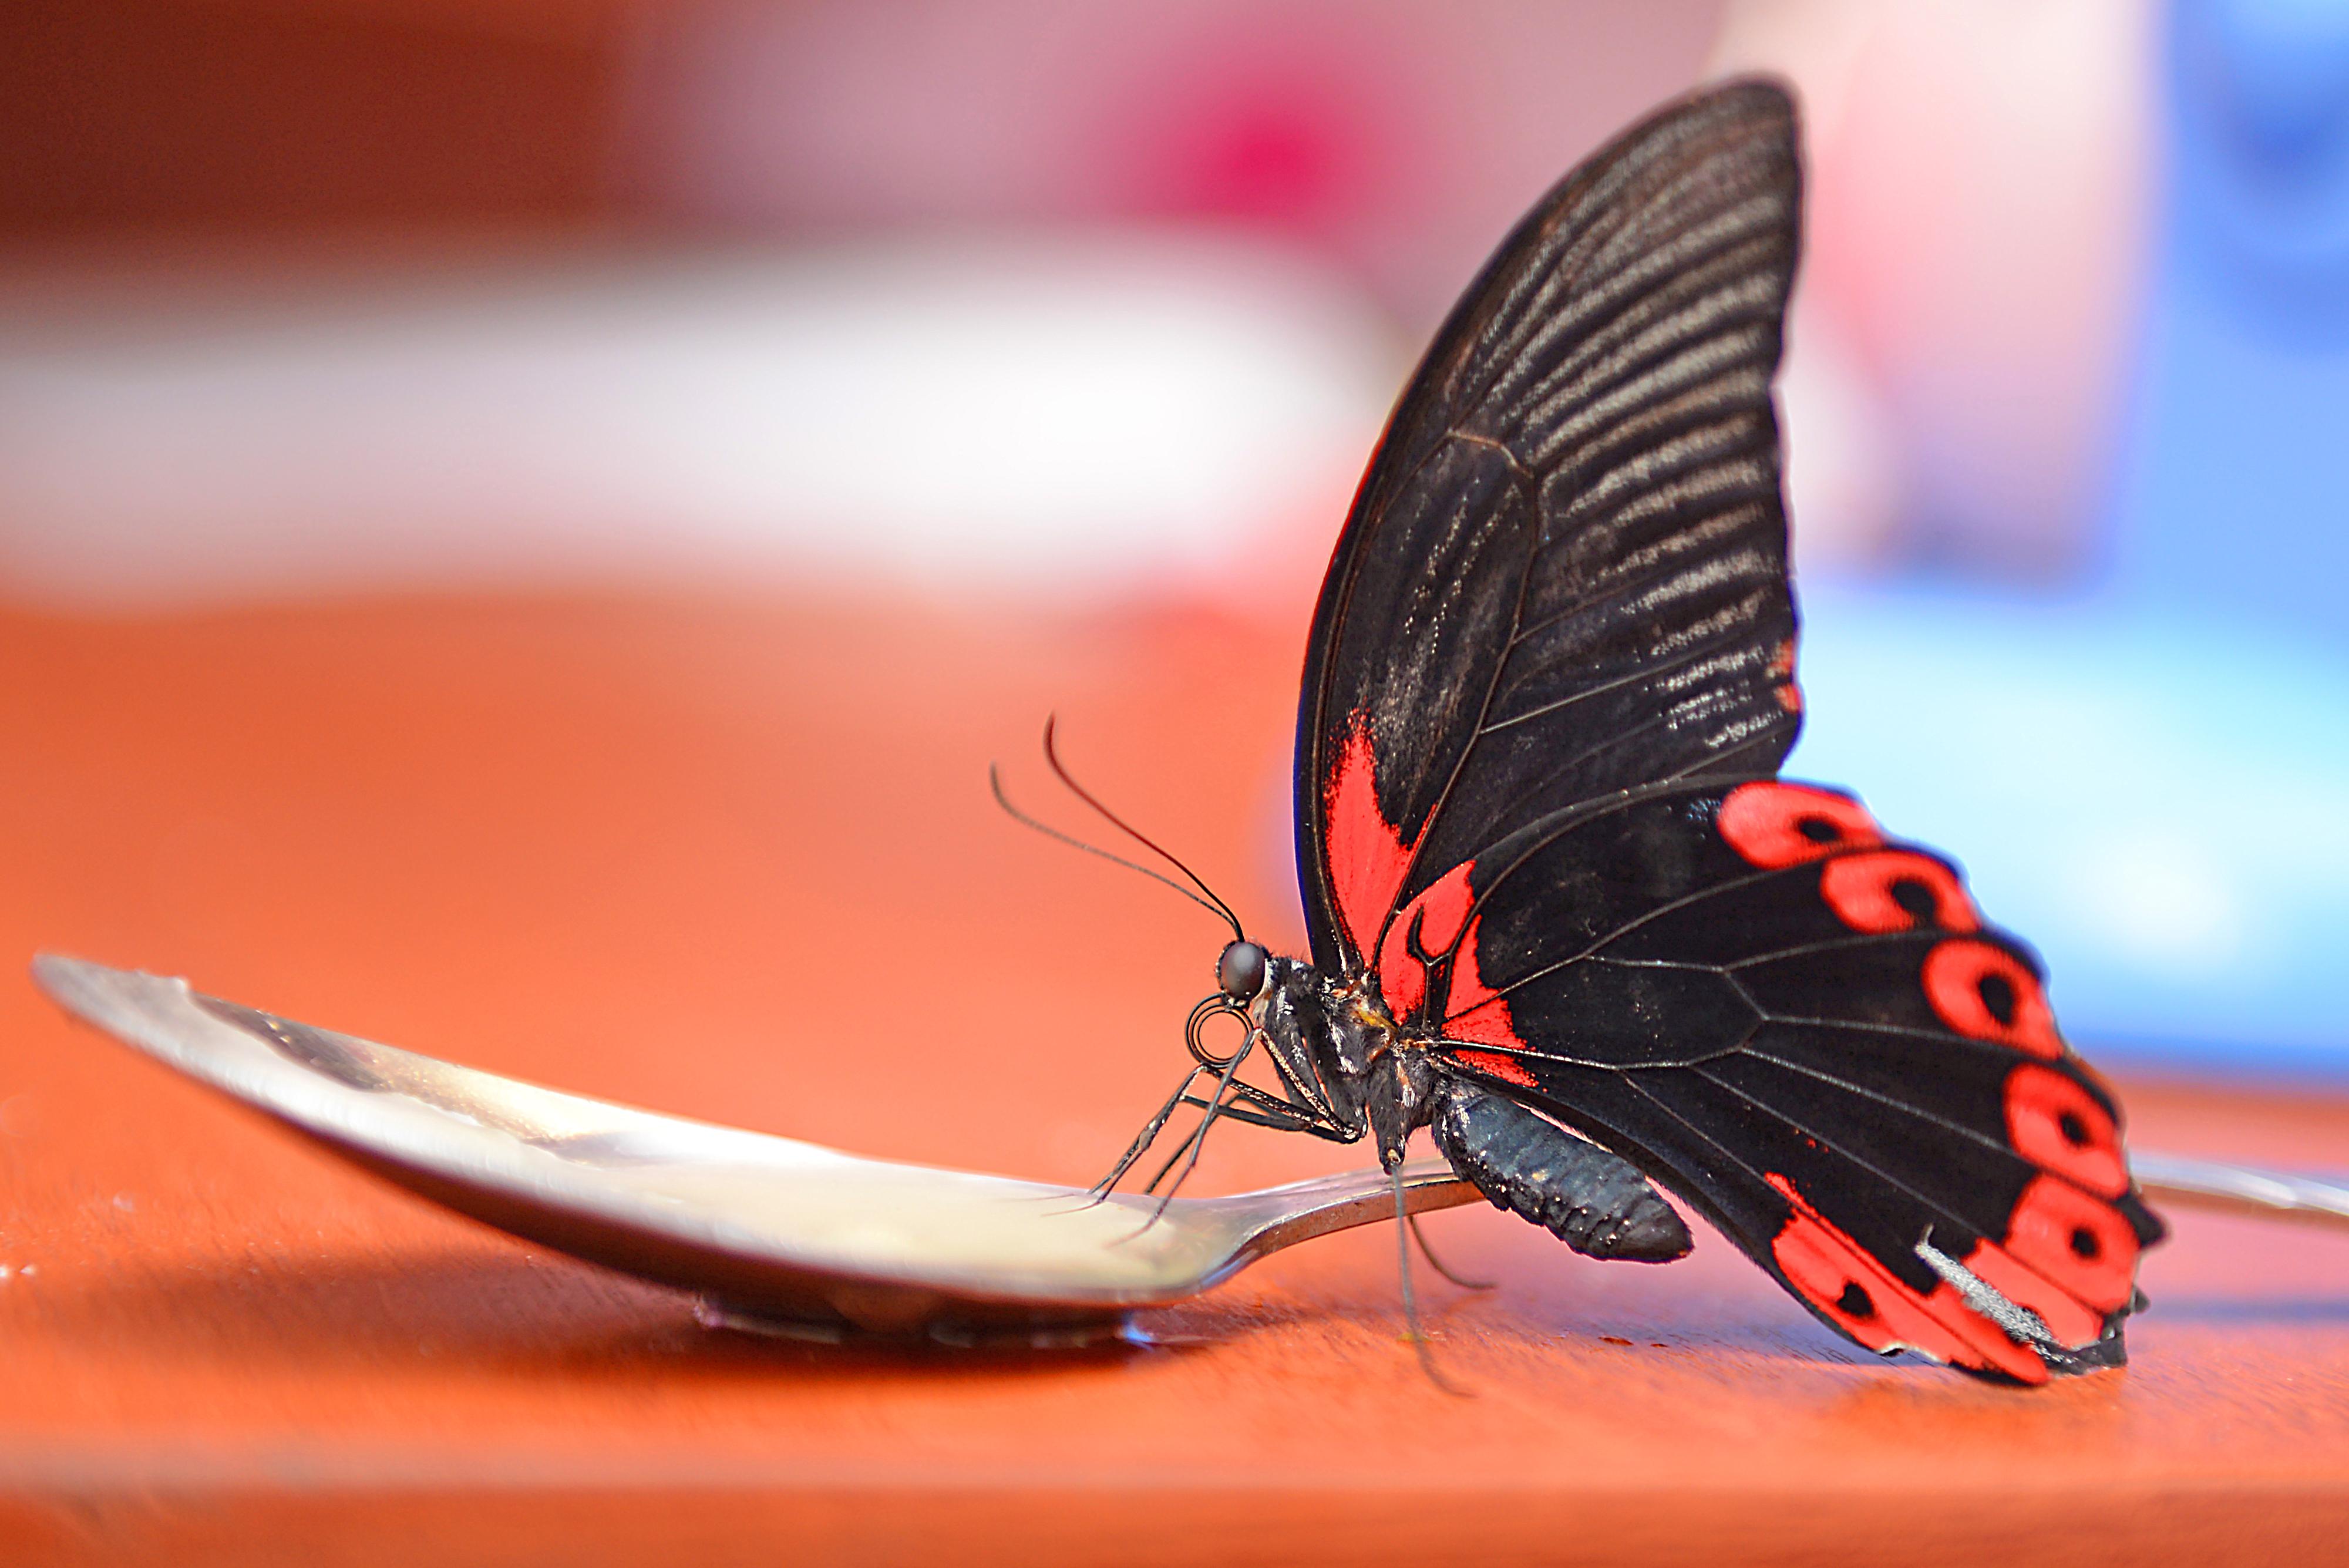 Хентай гостиница бабочка 2 фотография